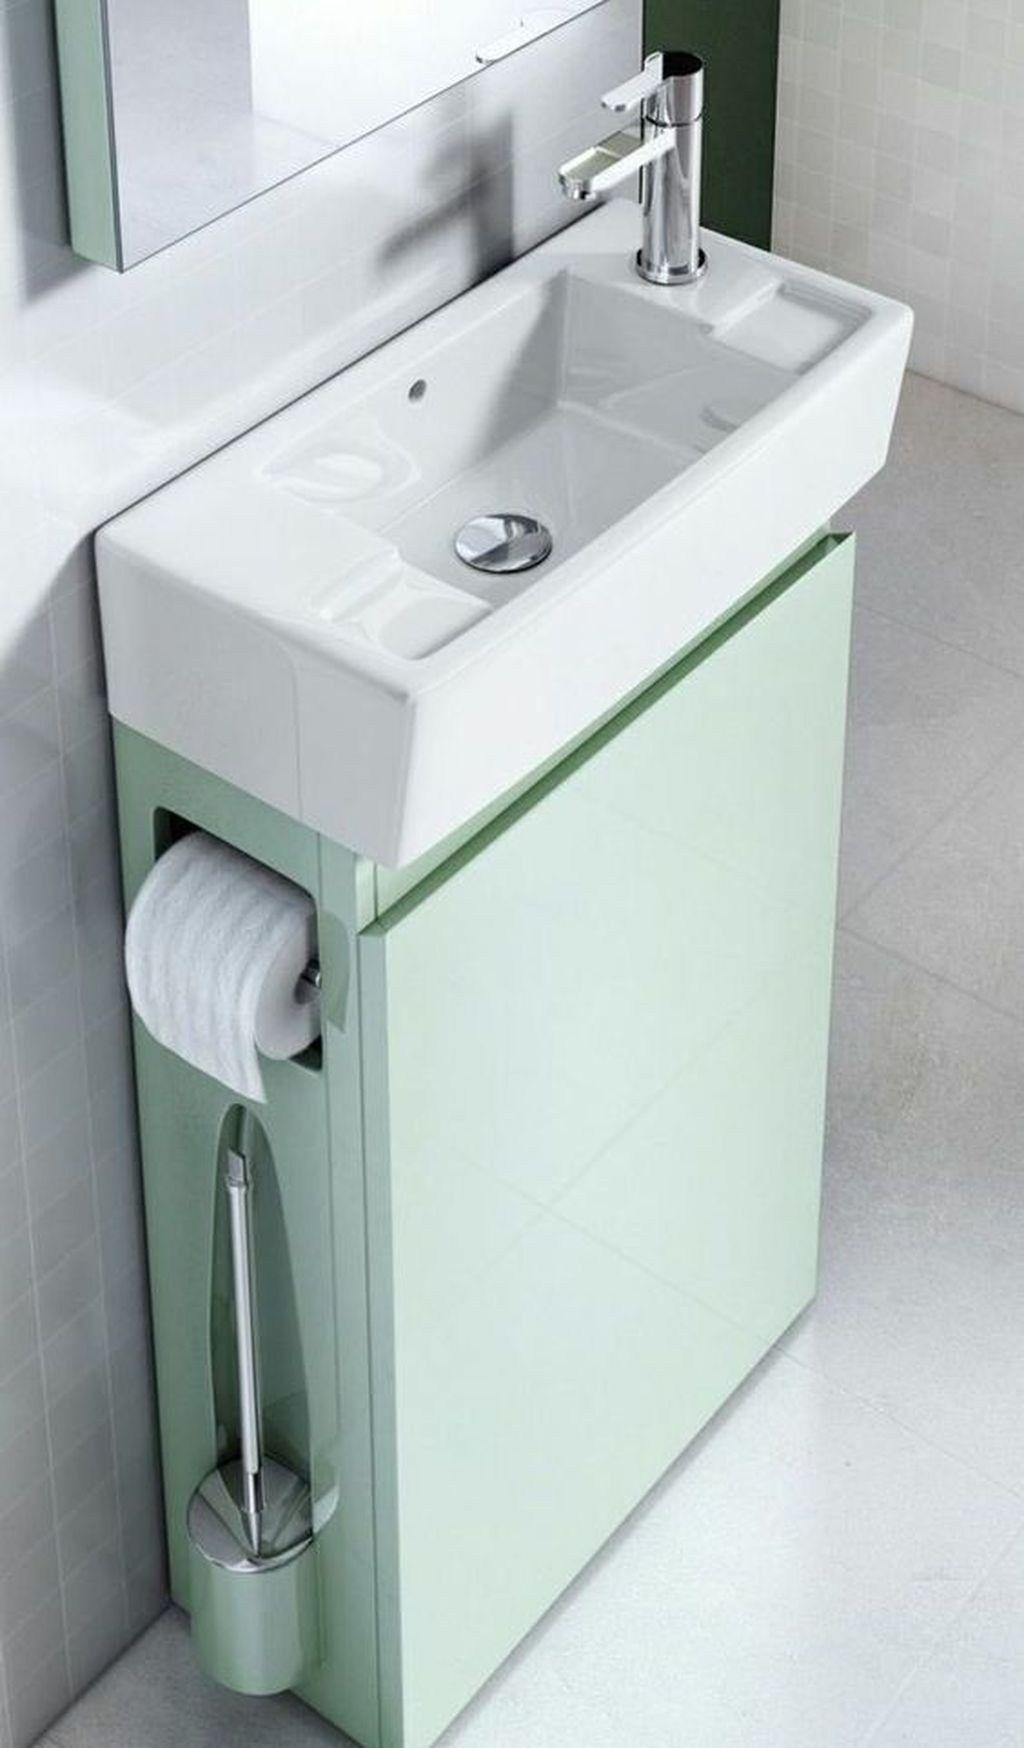 45 + Modern Small Bathroom Remodel Design Ideas - Home By X